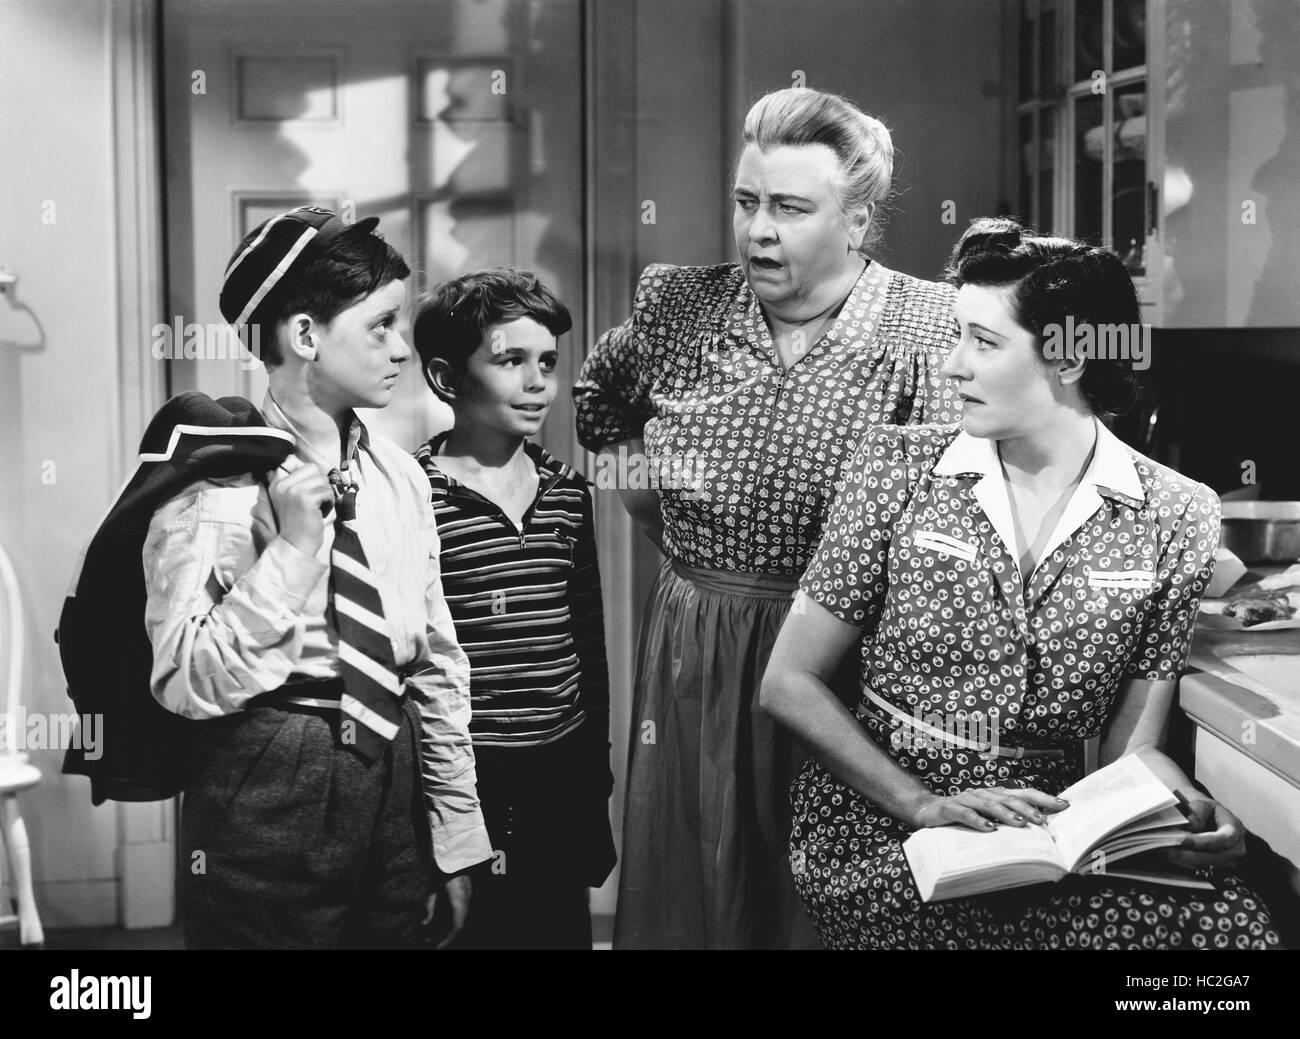 Melinda Marx,Jim Broadbent (born 1949) Hot movies Rachel Friend,Bryan Coleman (1911?005)